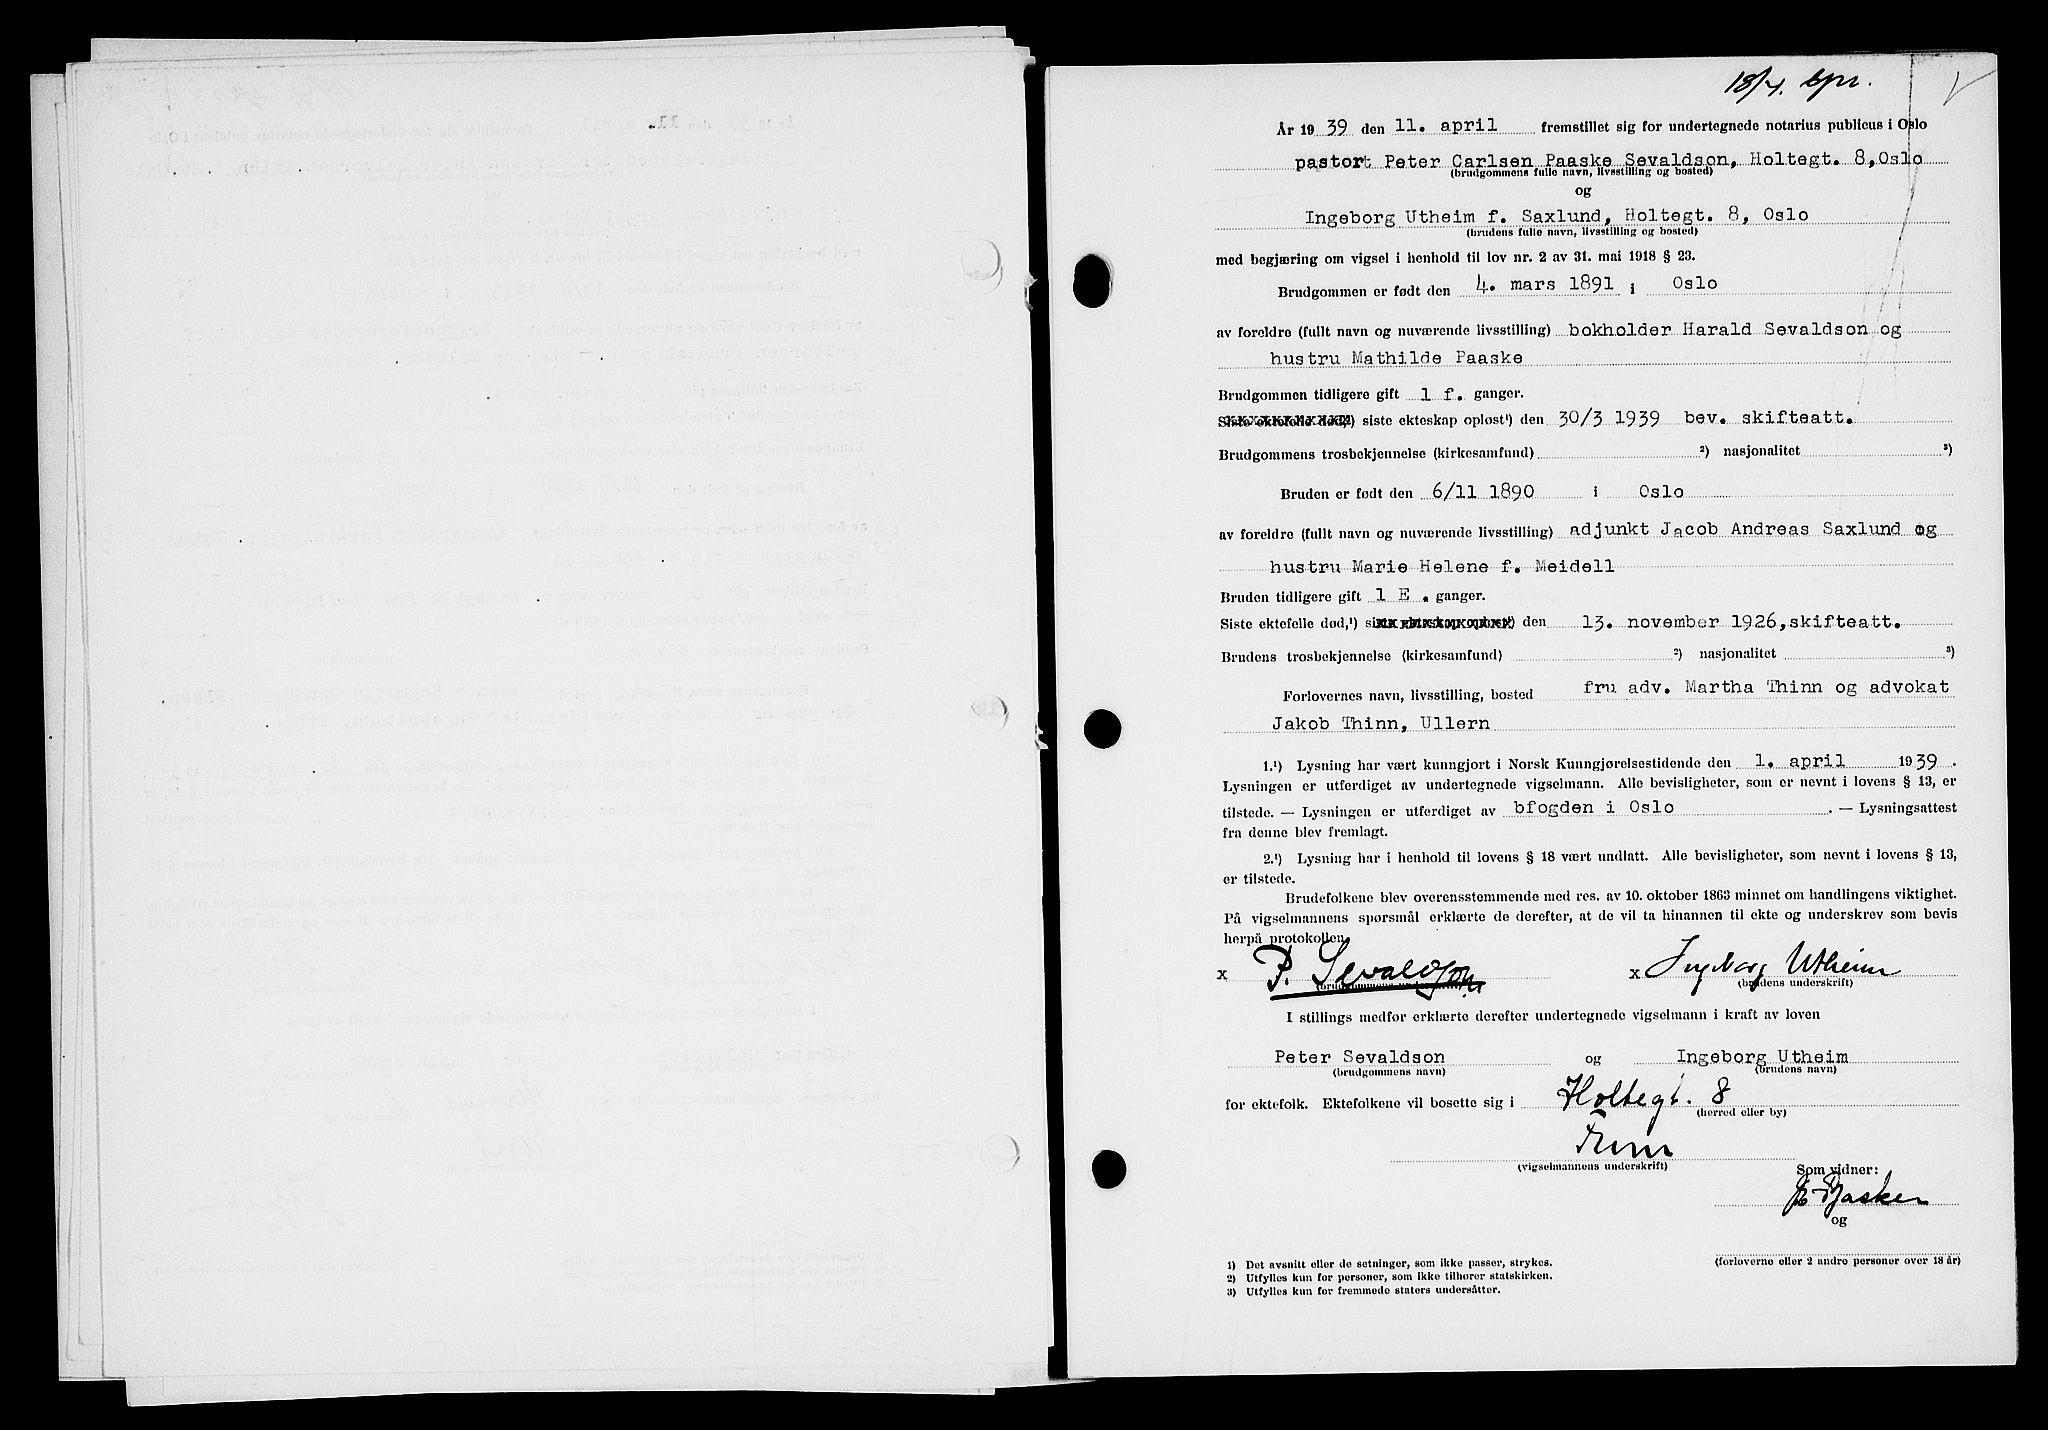 SAO, Oslo byfogd avd. I, L/Lb/Lbb/L0031: Notarialprotokoll, rekke II: Vigsler, 1938-1939